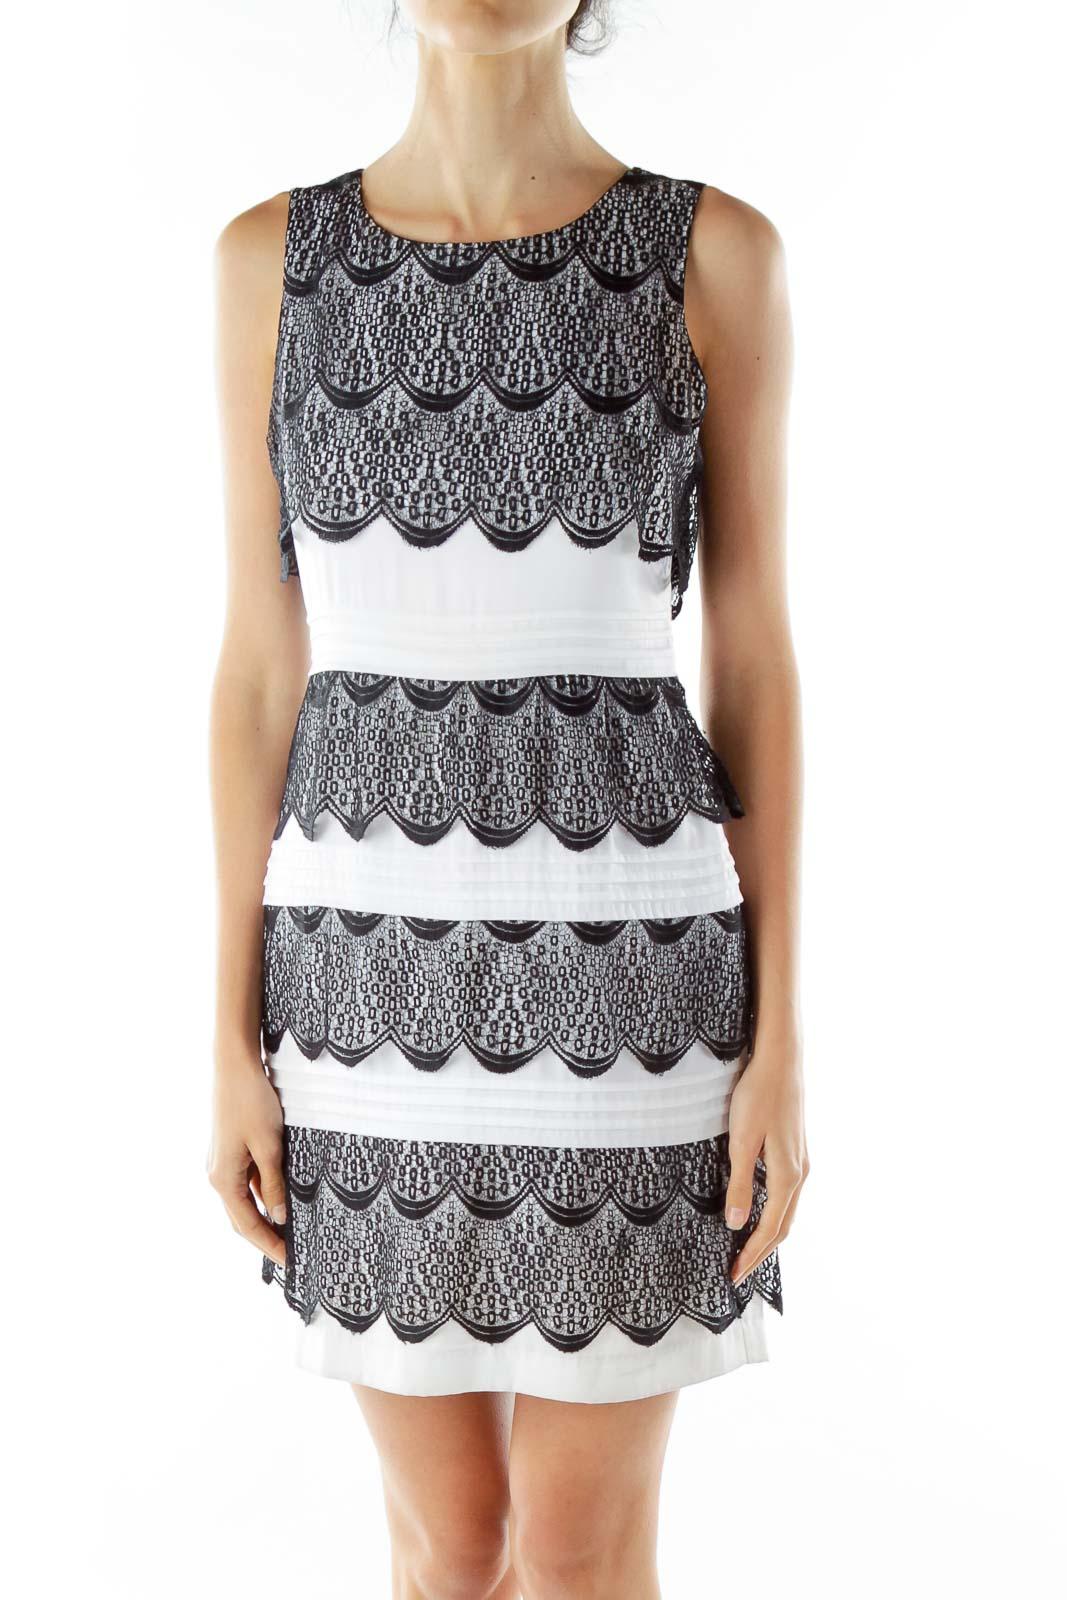 Black White Lace Cocktail Dress